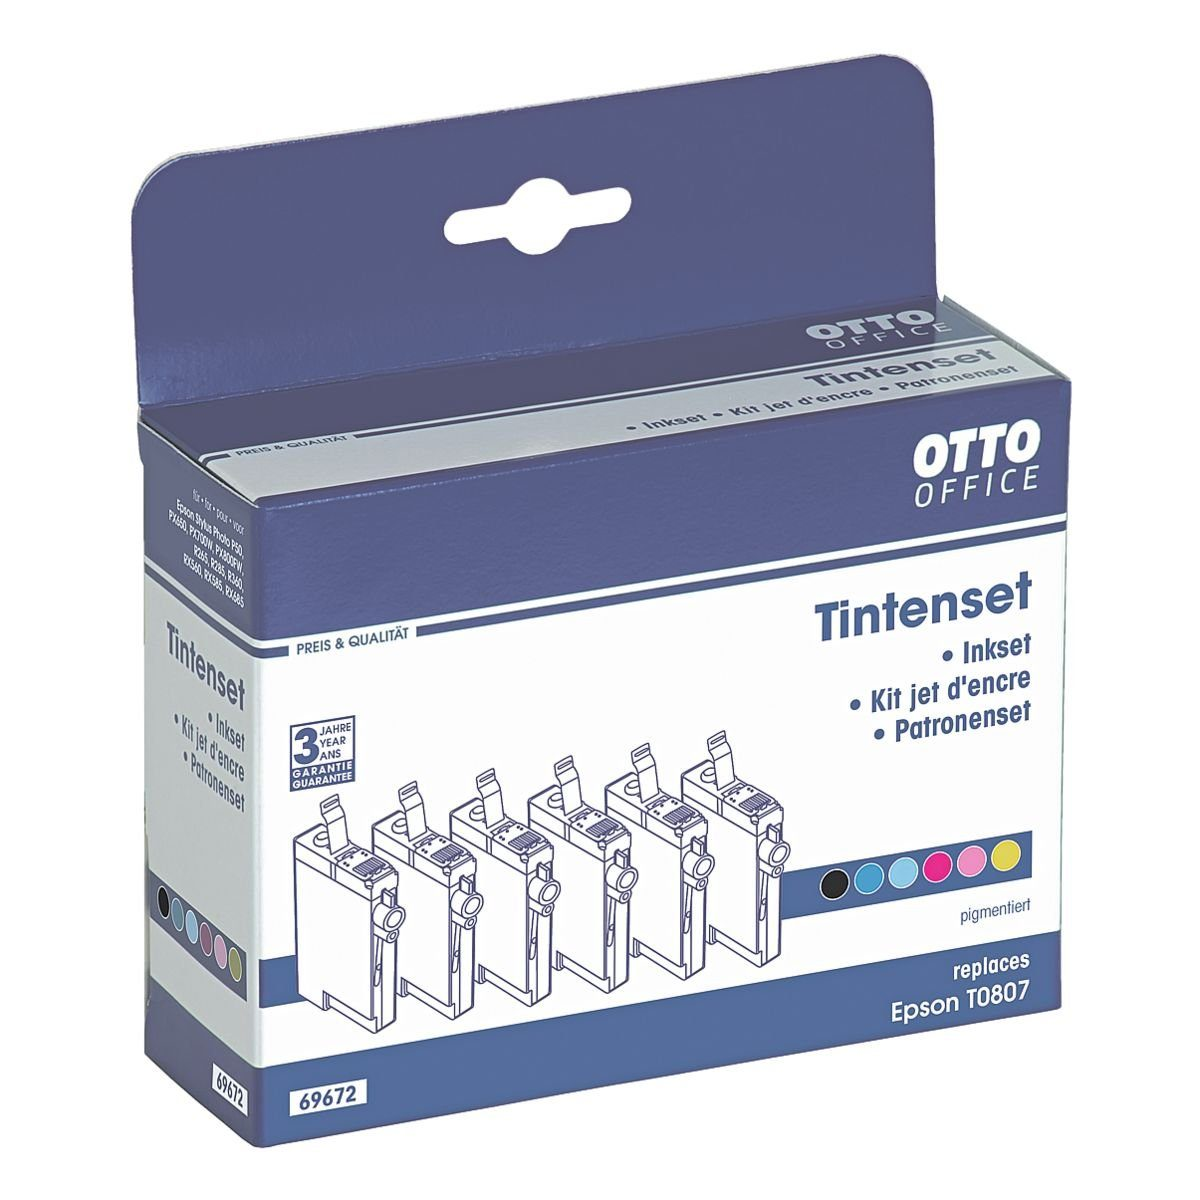 OTTO Office Standard Tintenpatronen-Multipack ersetzt Epson »T0807«